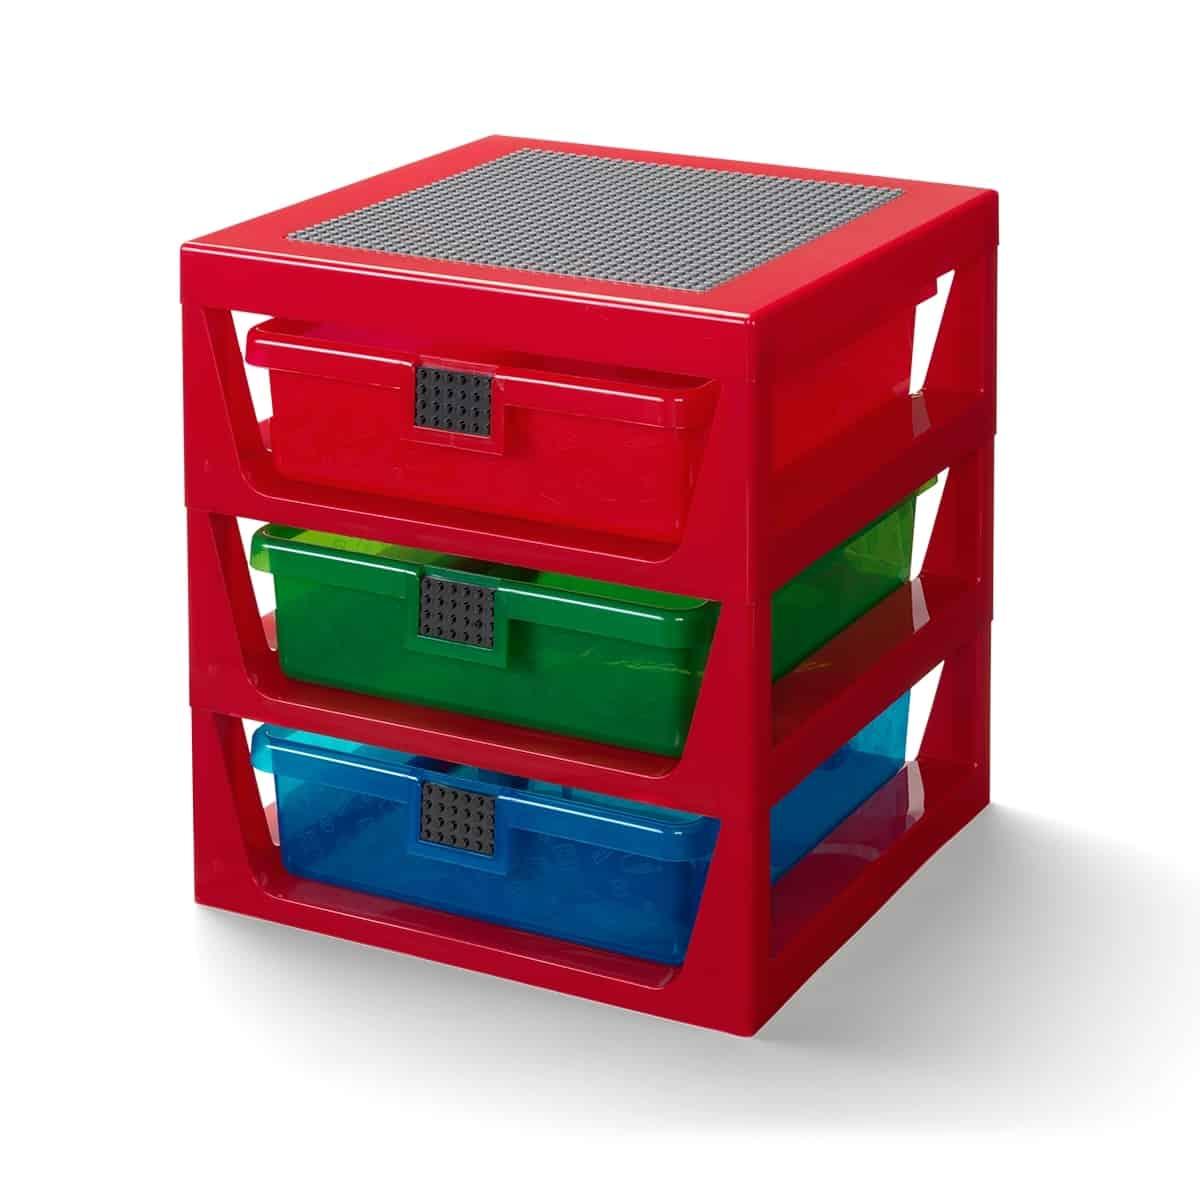 transparent red lego 5005873 rack system